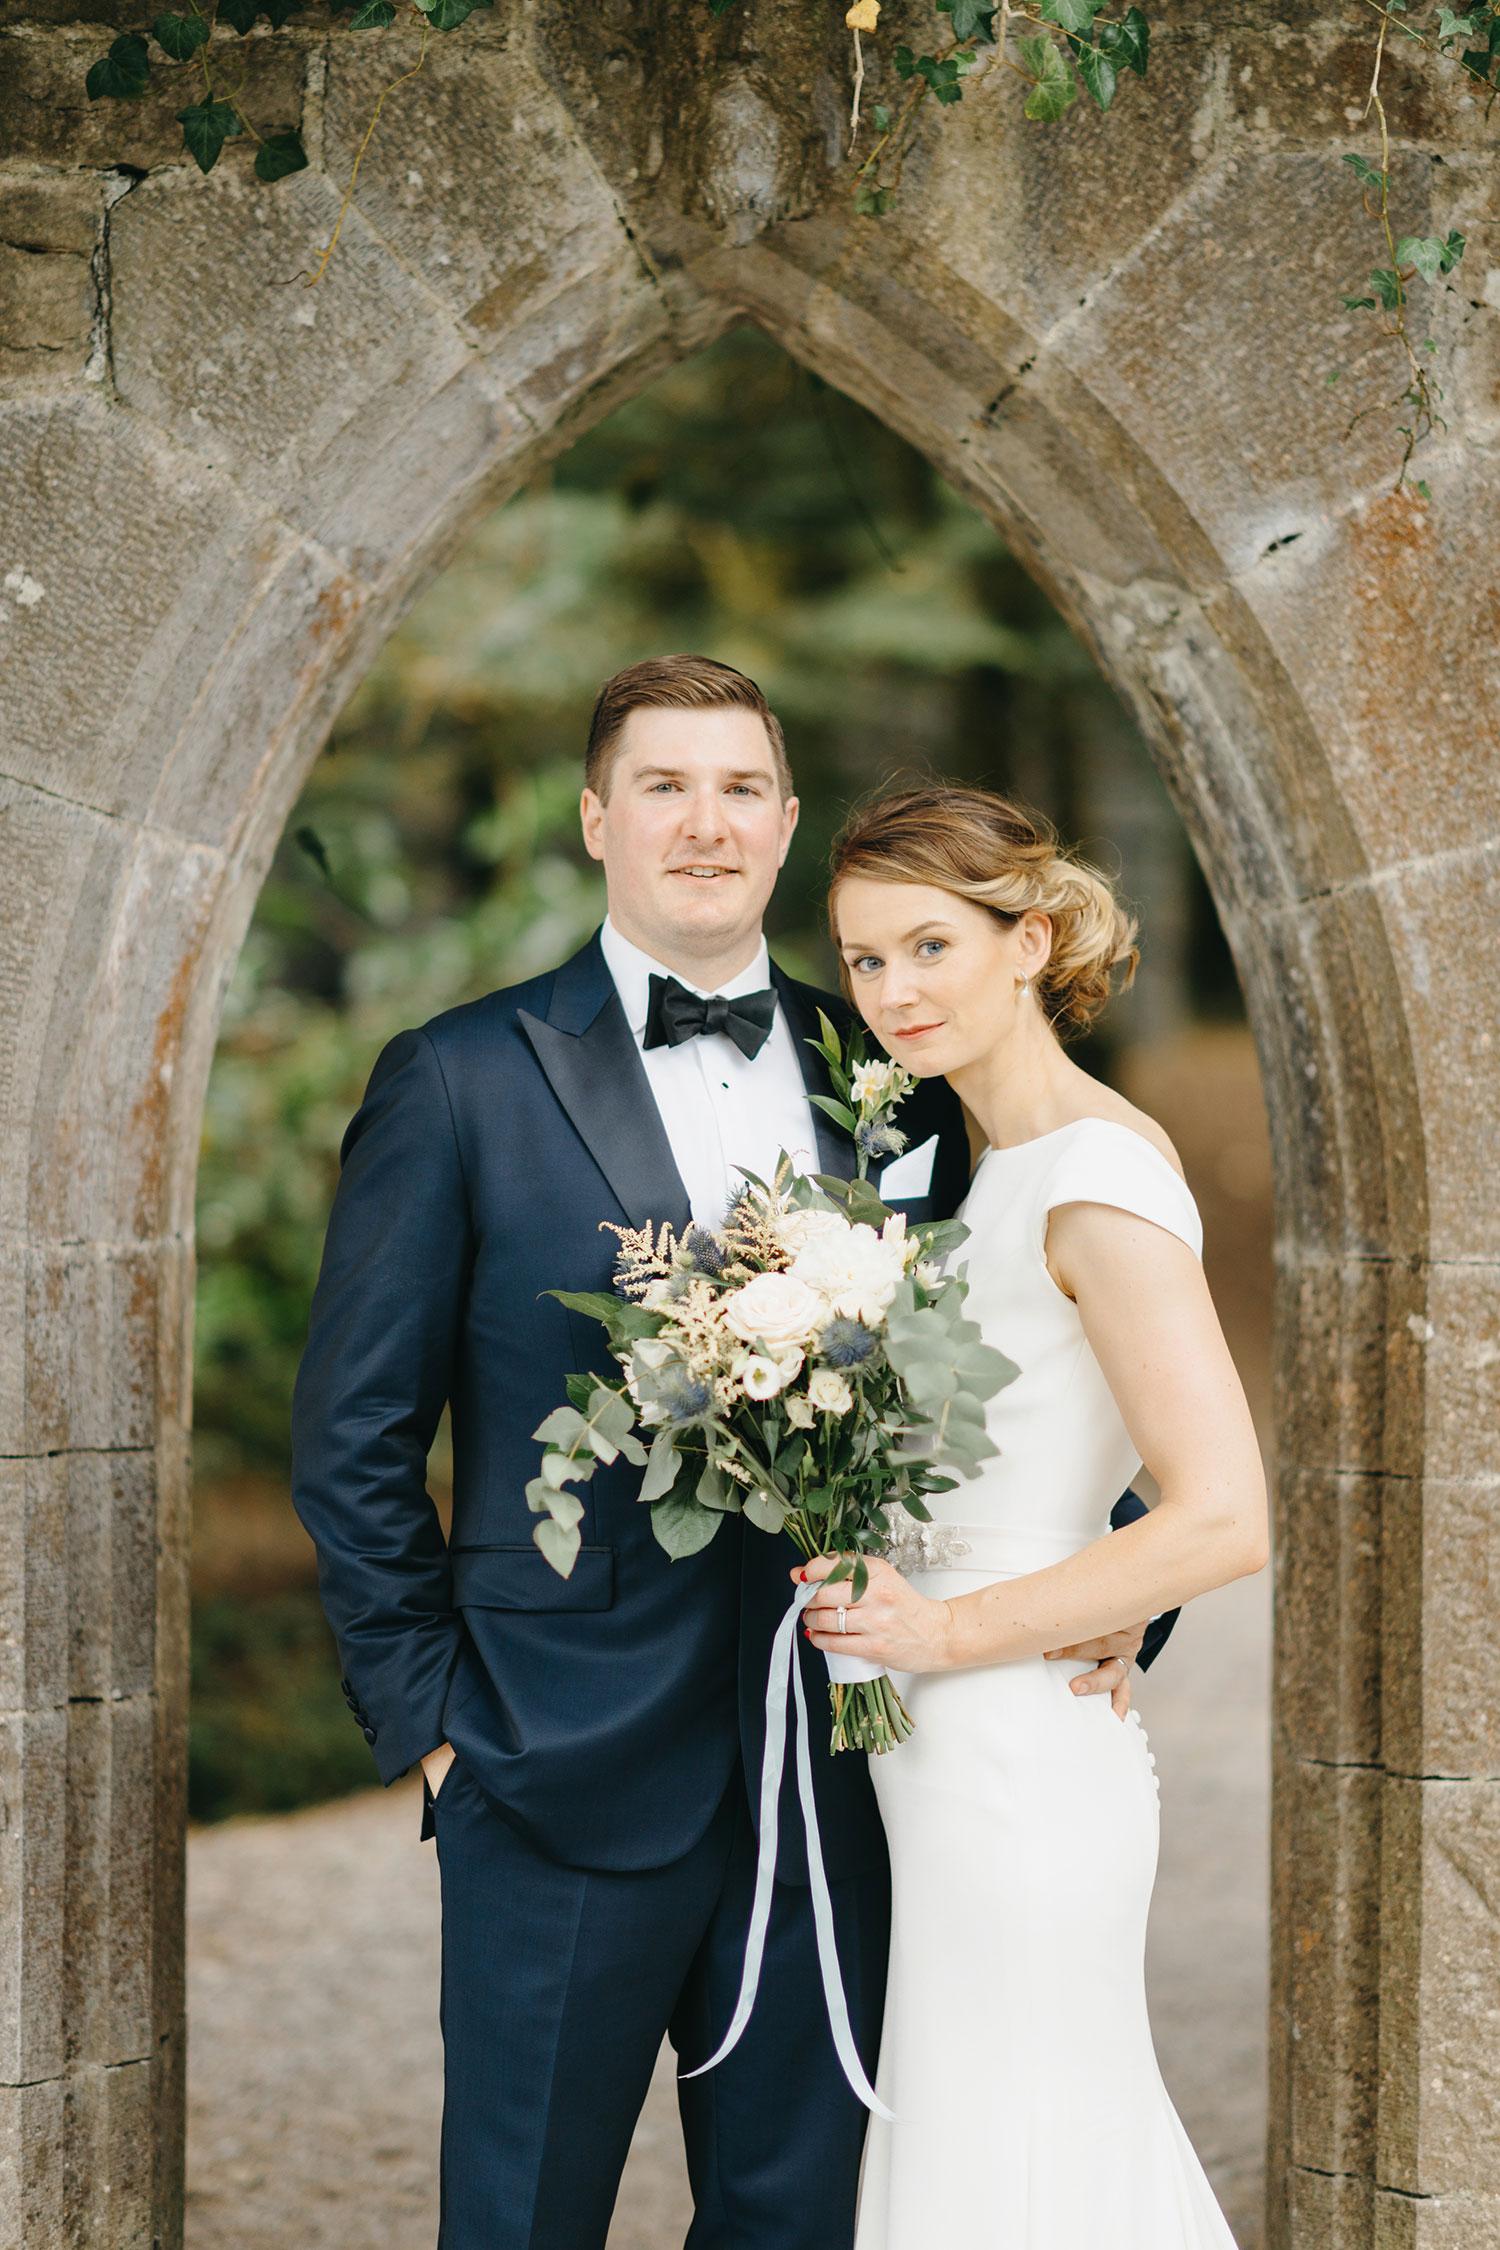 the-lodge-at-ashford-castle-wedding-photography-0114_1035.jpg